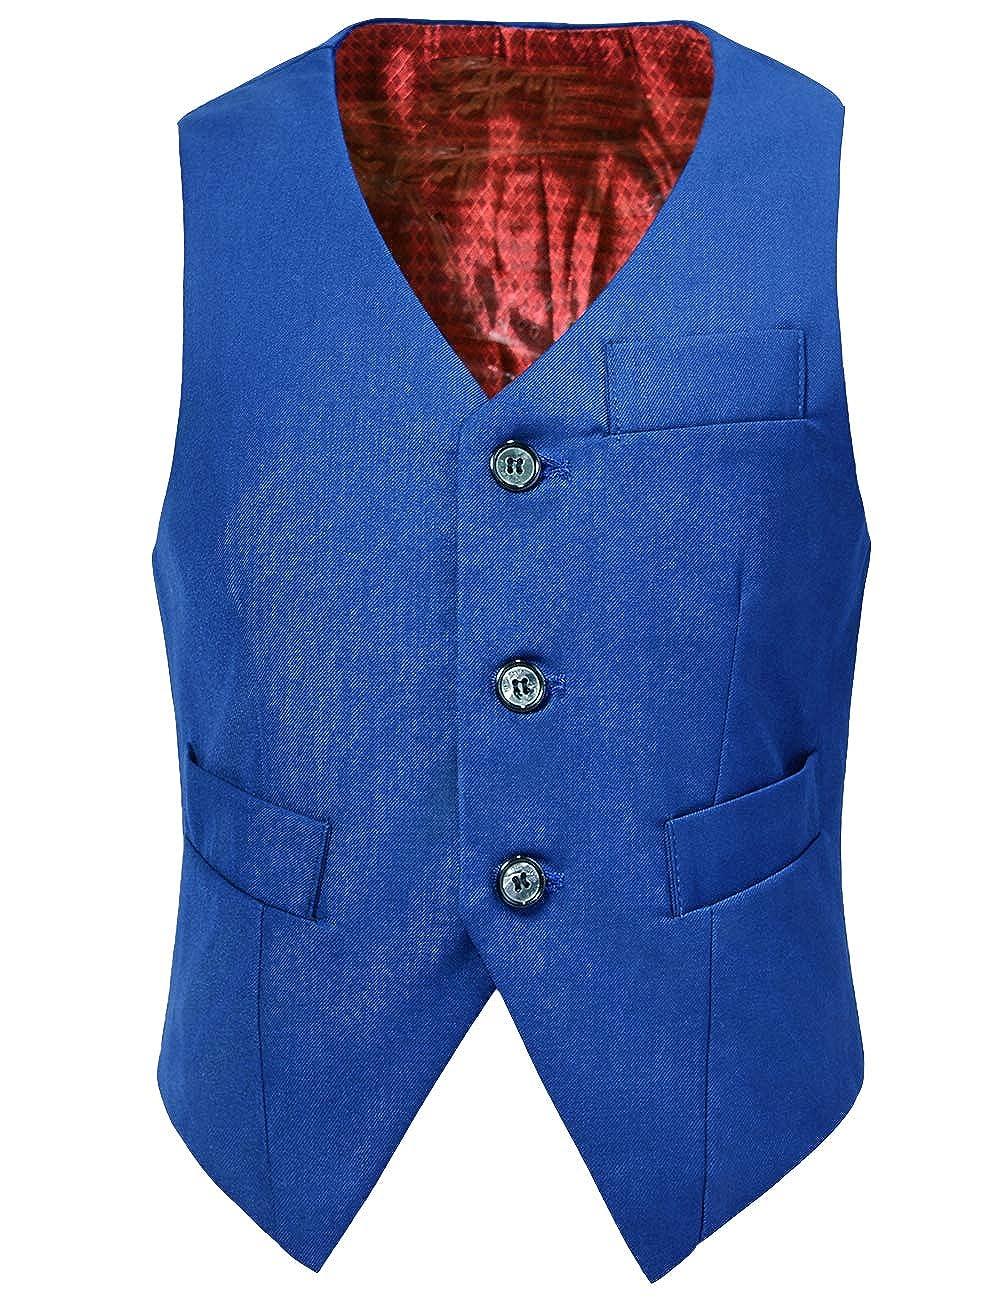 Visaccy 3 Buttons Boys Girls Fully Lined Formal Suit Vest HHM-Vest01